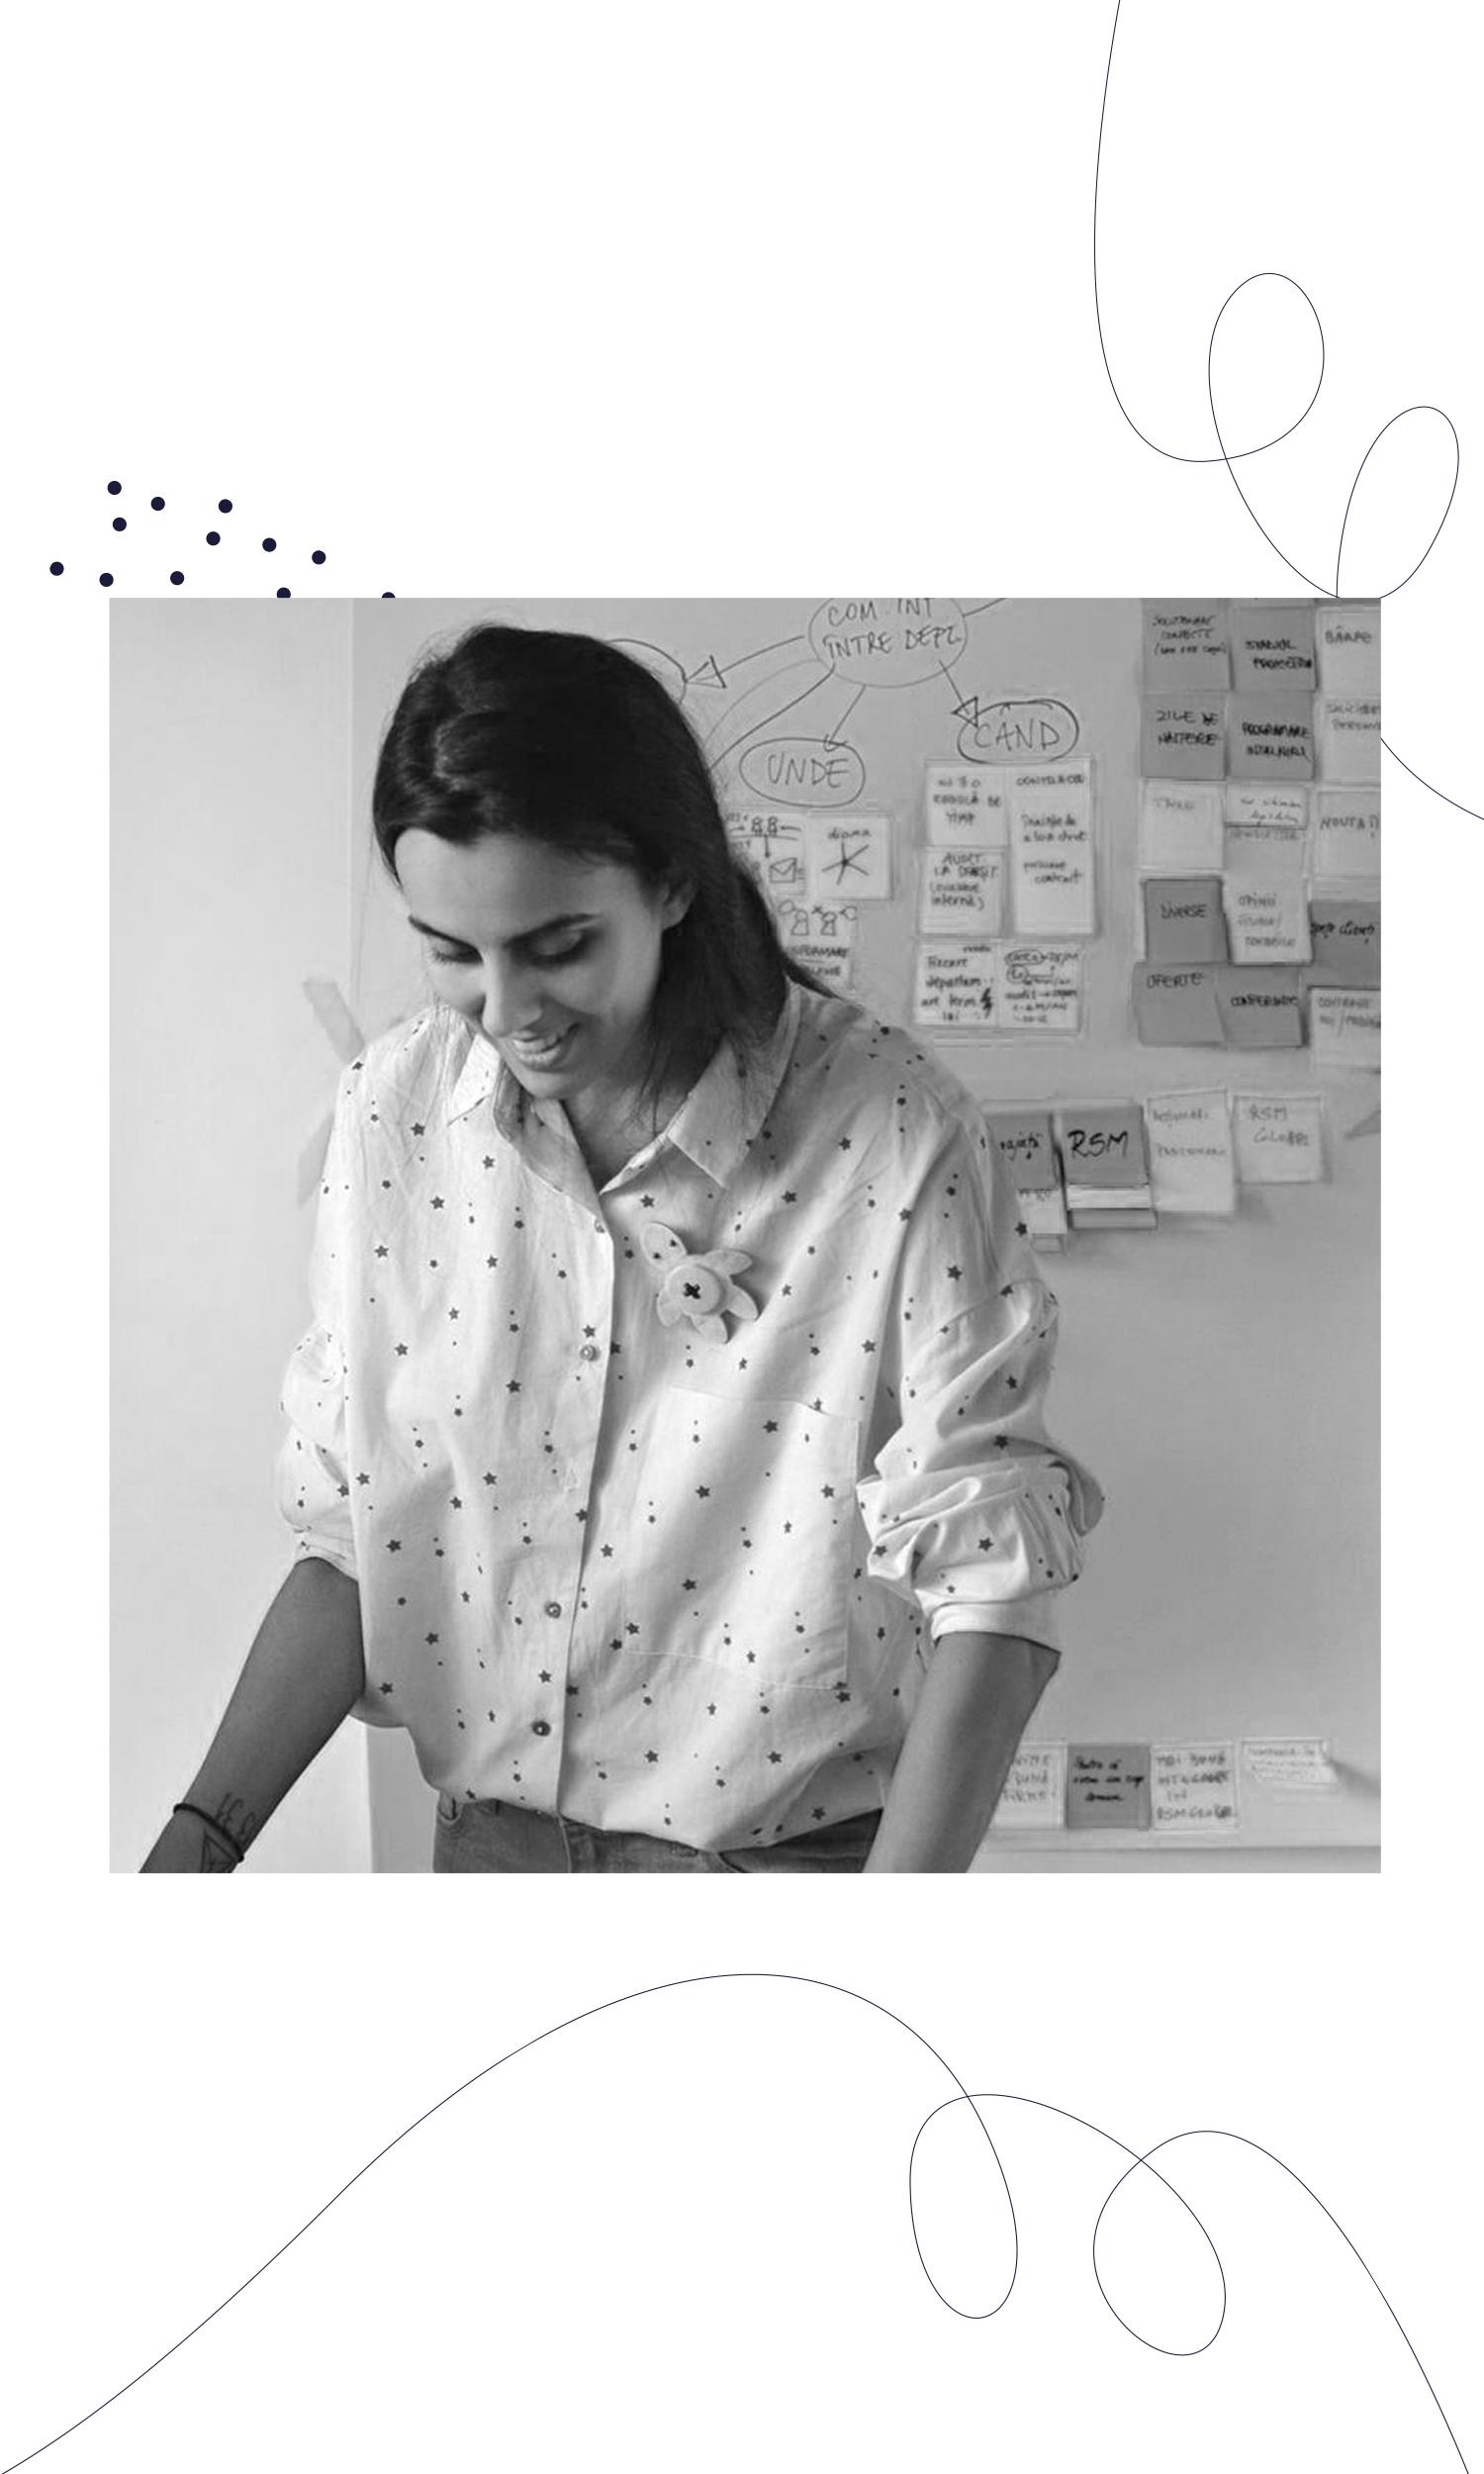 Andreea Nitoi - Andreea Nitoi este consultant in branding si facilitator de gandire creativa; in ultimii ani, a facilitat peste 150 de sesiuni de creative-problem-solving, design thinking si brand thinking pentru proiecte antreprenoriale, companii multinationale, si organizatii non-profit. Andreea este co-fondatorul Asociatiei Crea-Est, alaturi de care organizeaza conferinta Rebranding Creativity — prima conferinta de creativitate aplicata din Romania.